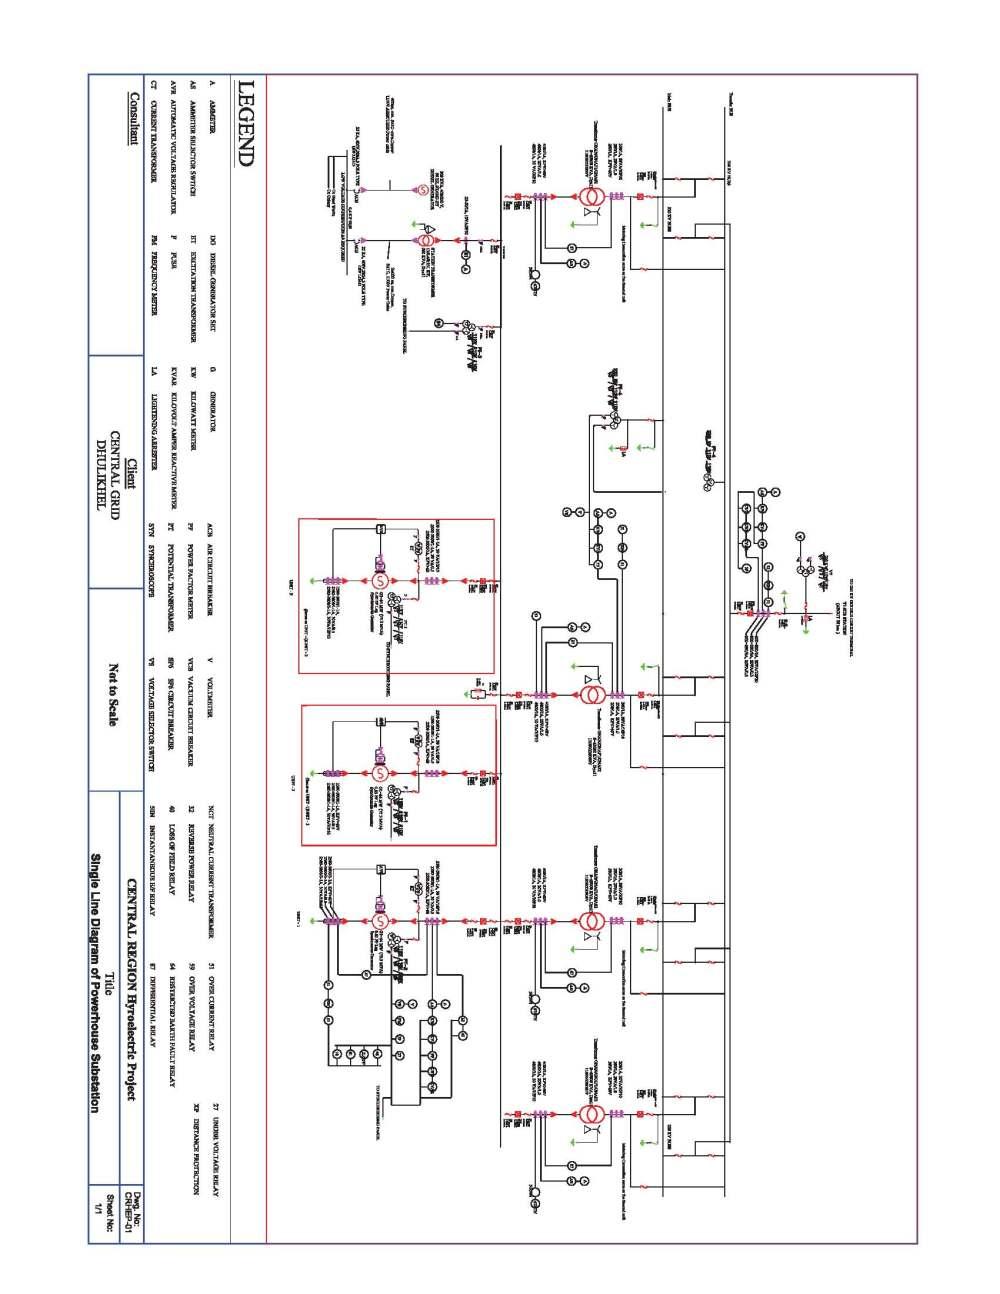 medium resolution of power plant one line diagram my wiring diagrampower plant one line diagram wiring diagram sample power